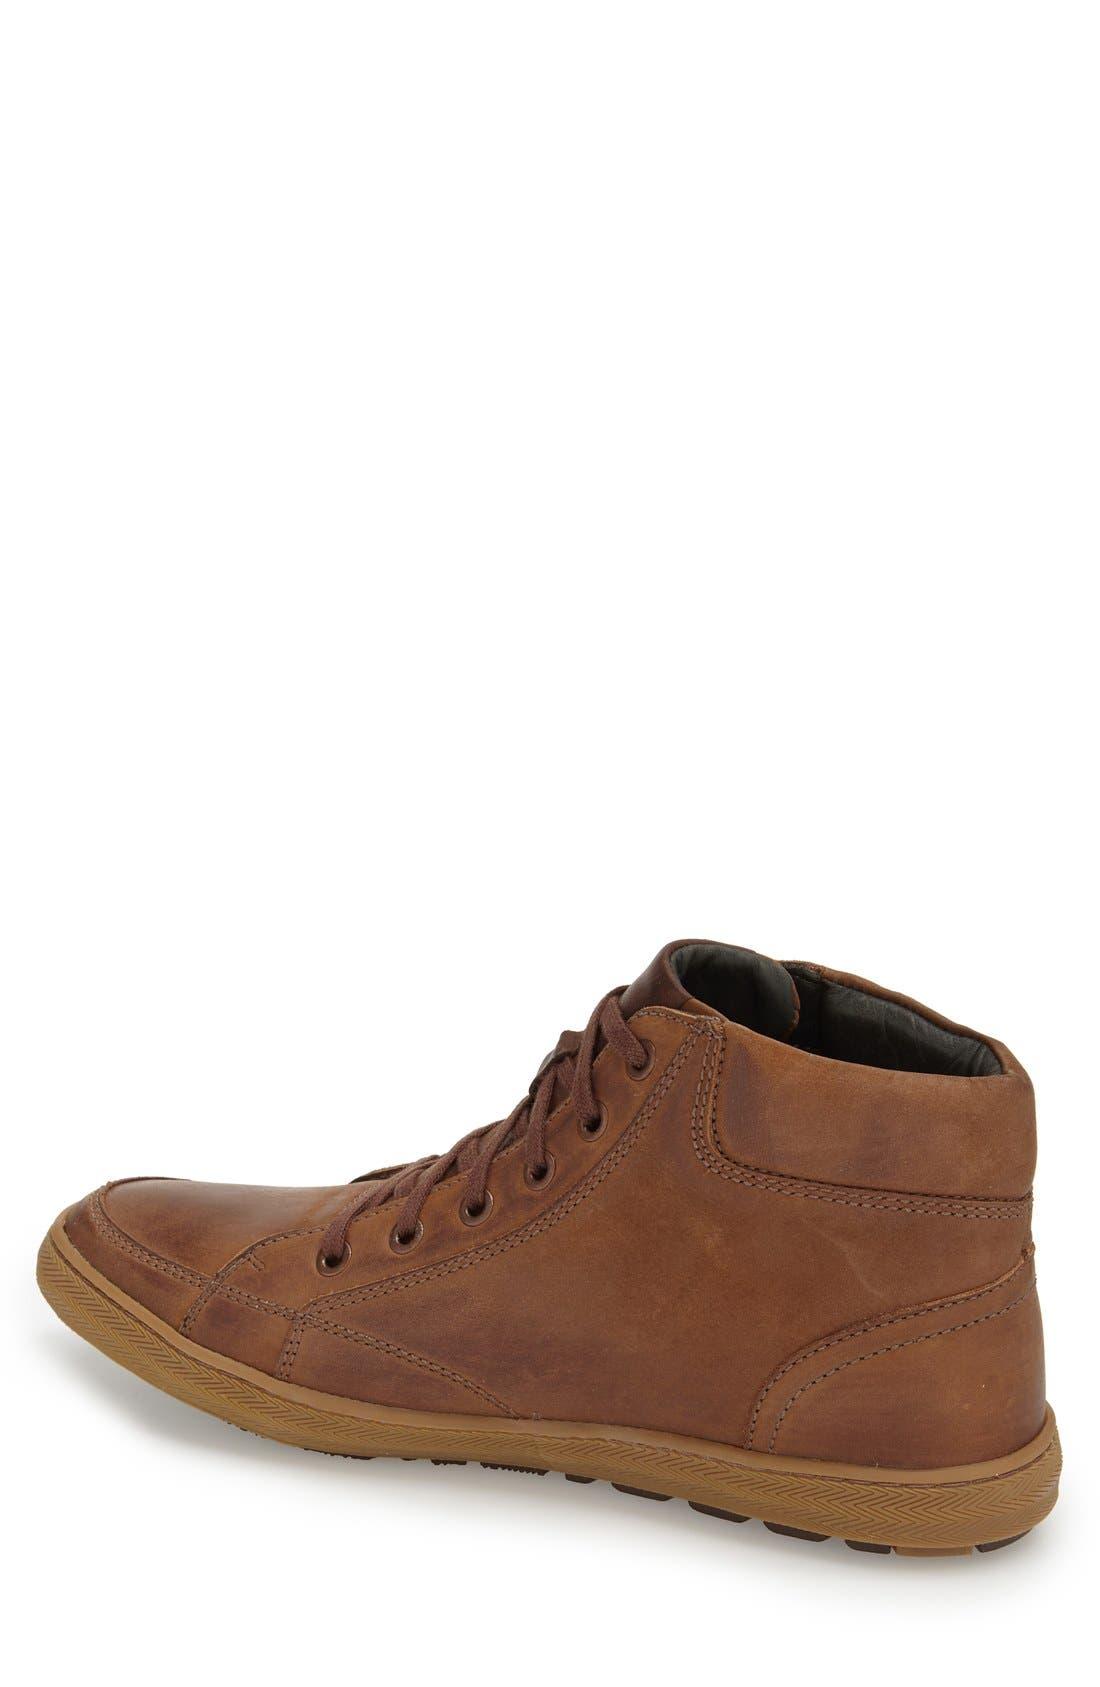 Santos Sneaker,                             Alternate thumbnail 2, color,                             Brown